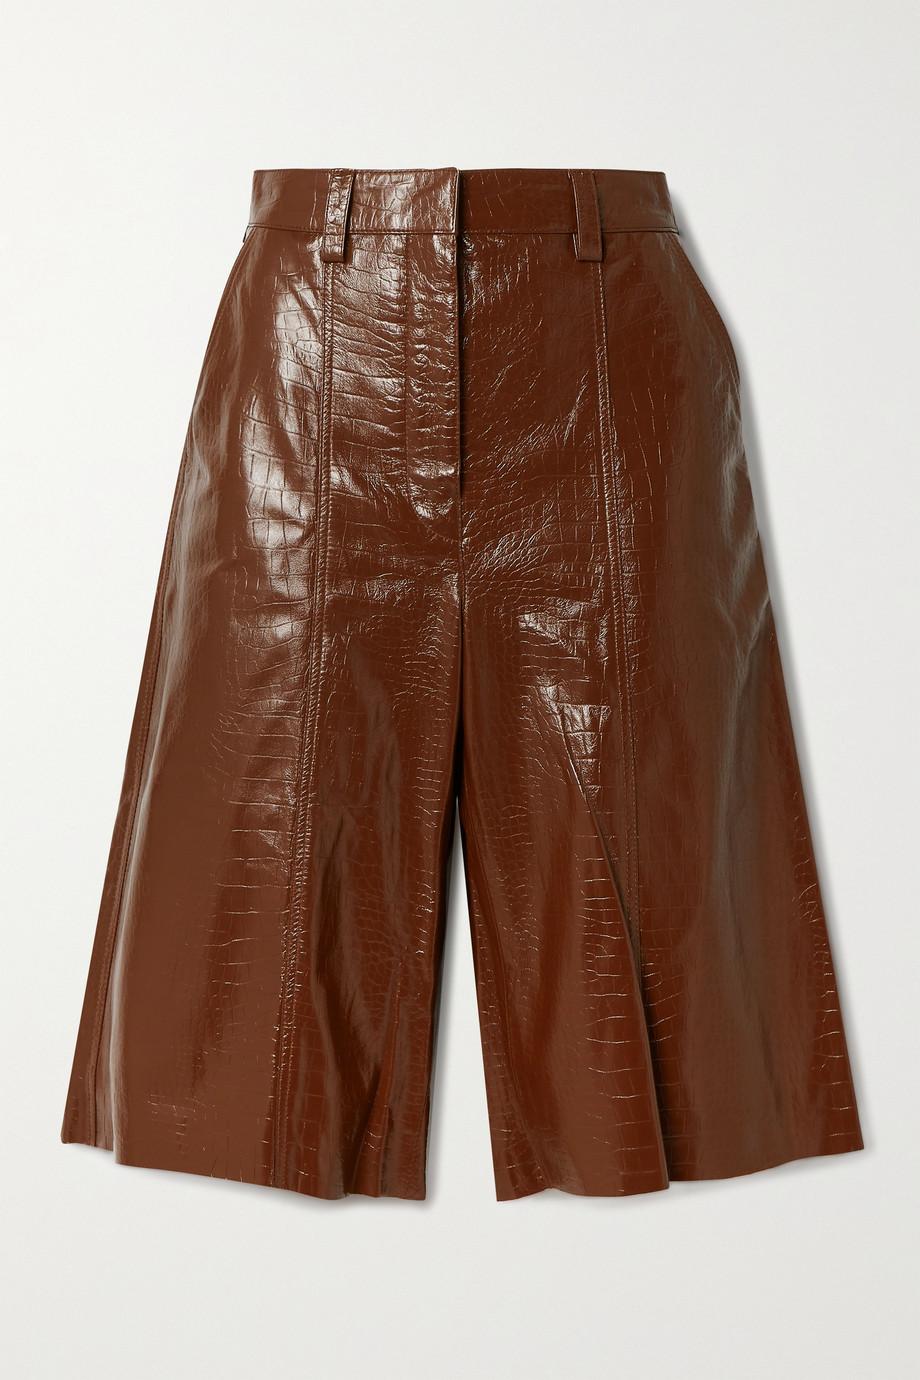 Dodo Bar Or Ivgenya croc-effect leather shorts